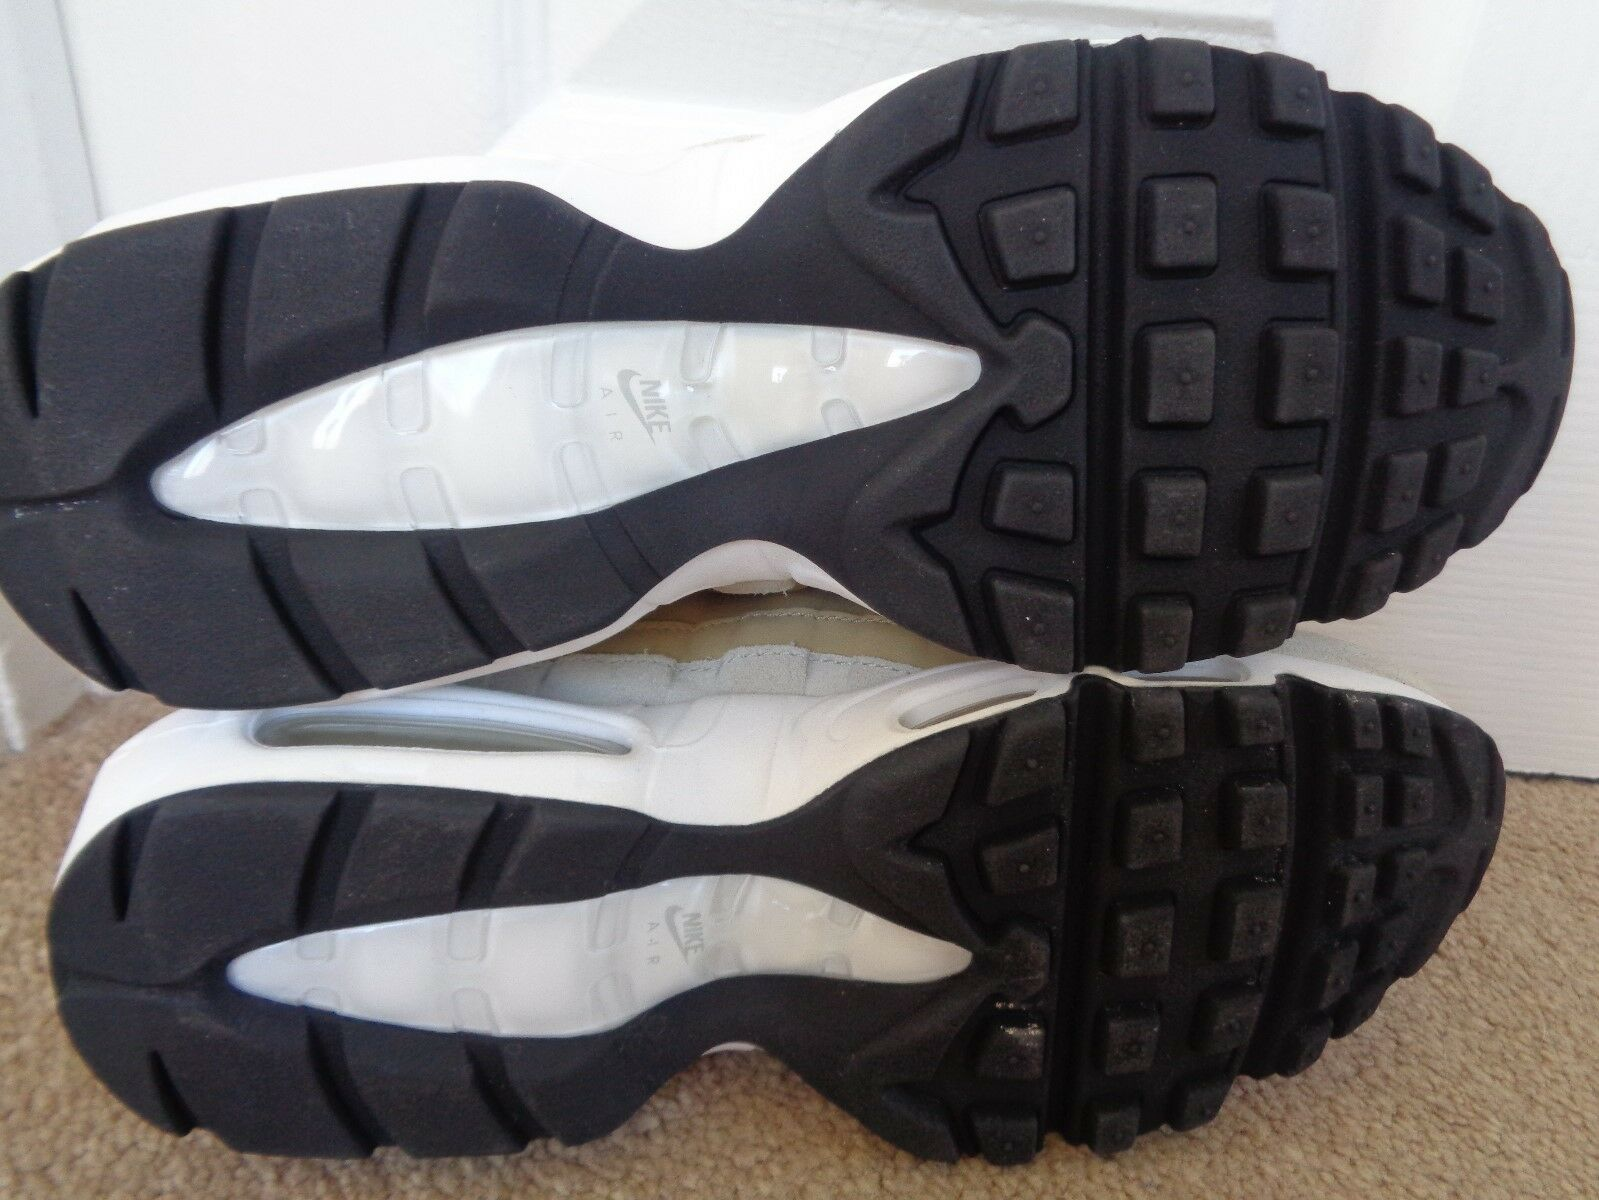 Nike Max Air Max Nike 95 Damenss schuhe trainers 307960 009 uk 5.5 eu 39 us 8 NEW + BOX 300805